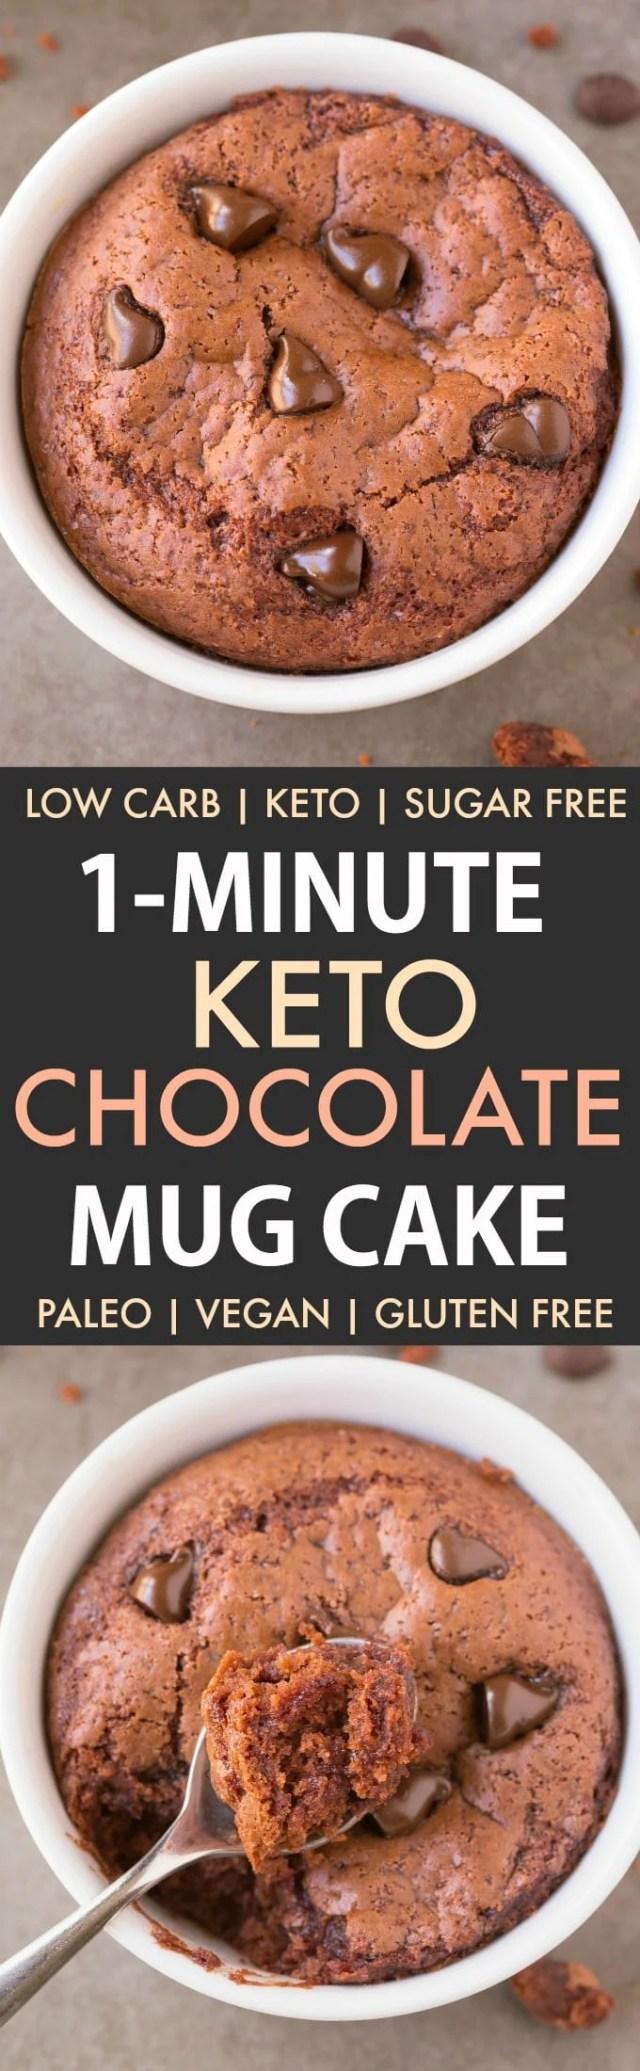 1-Minute Keto Chocolate Mug Cake in a collage